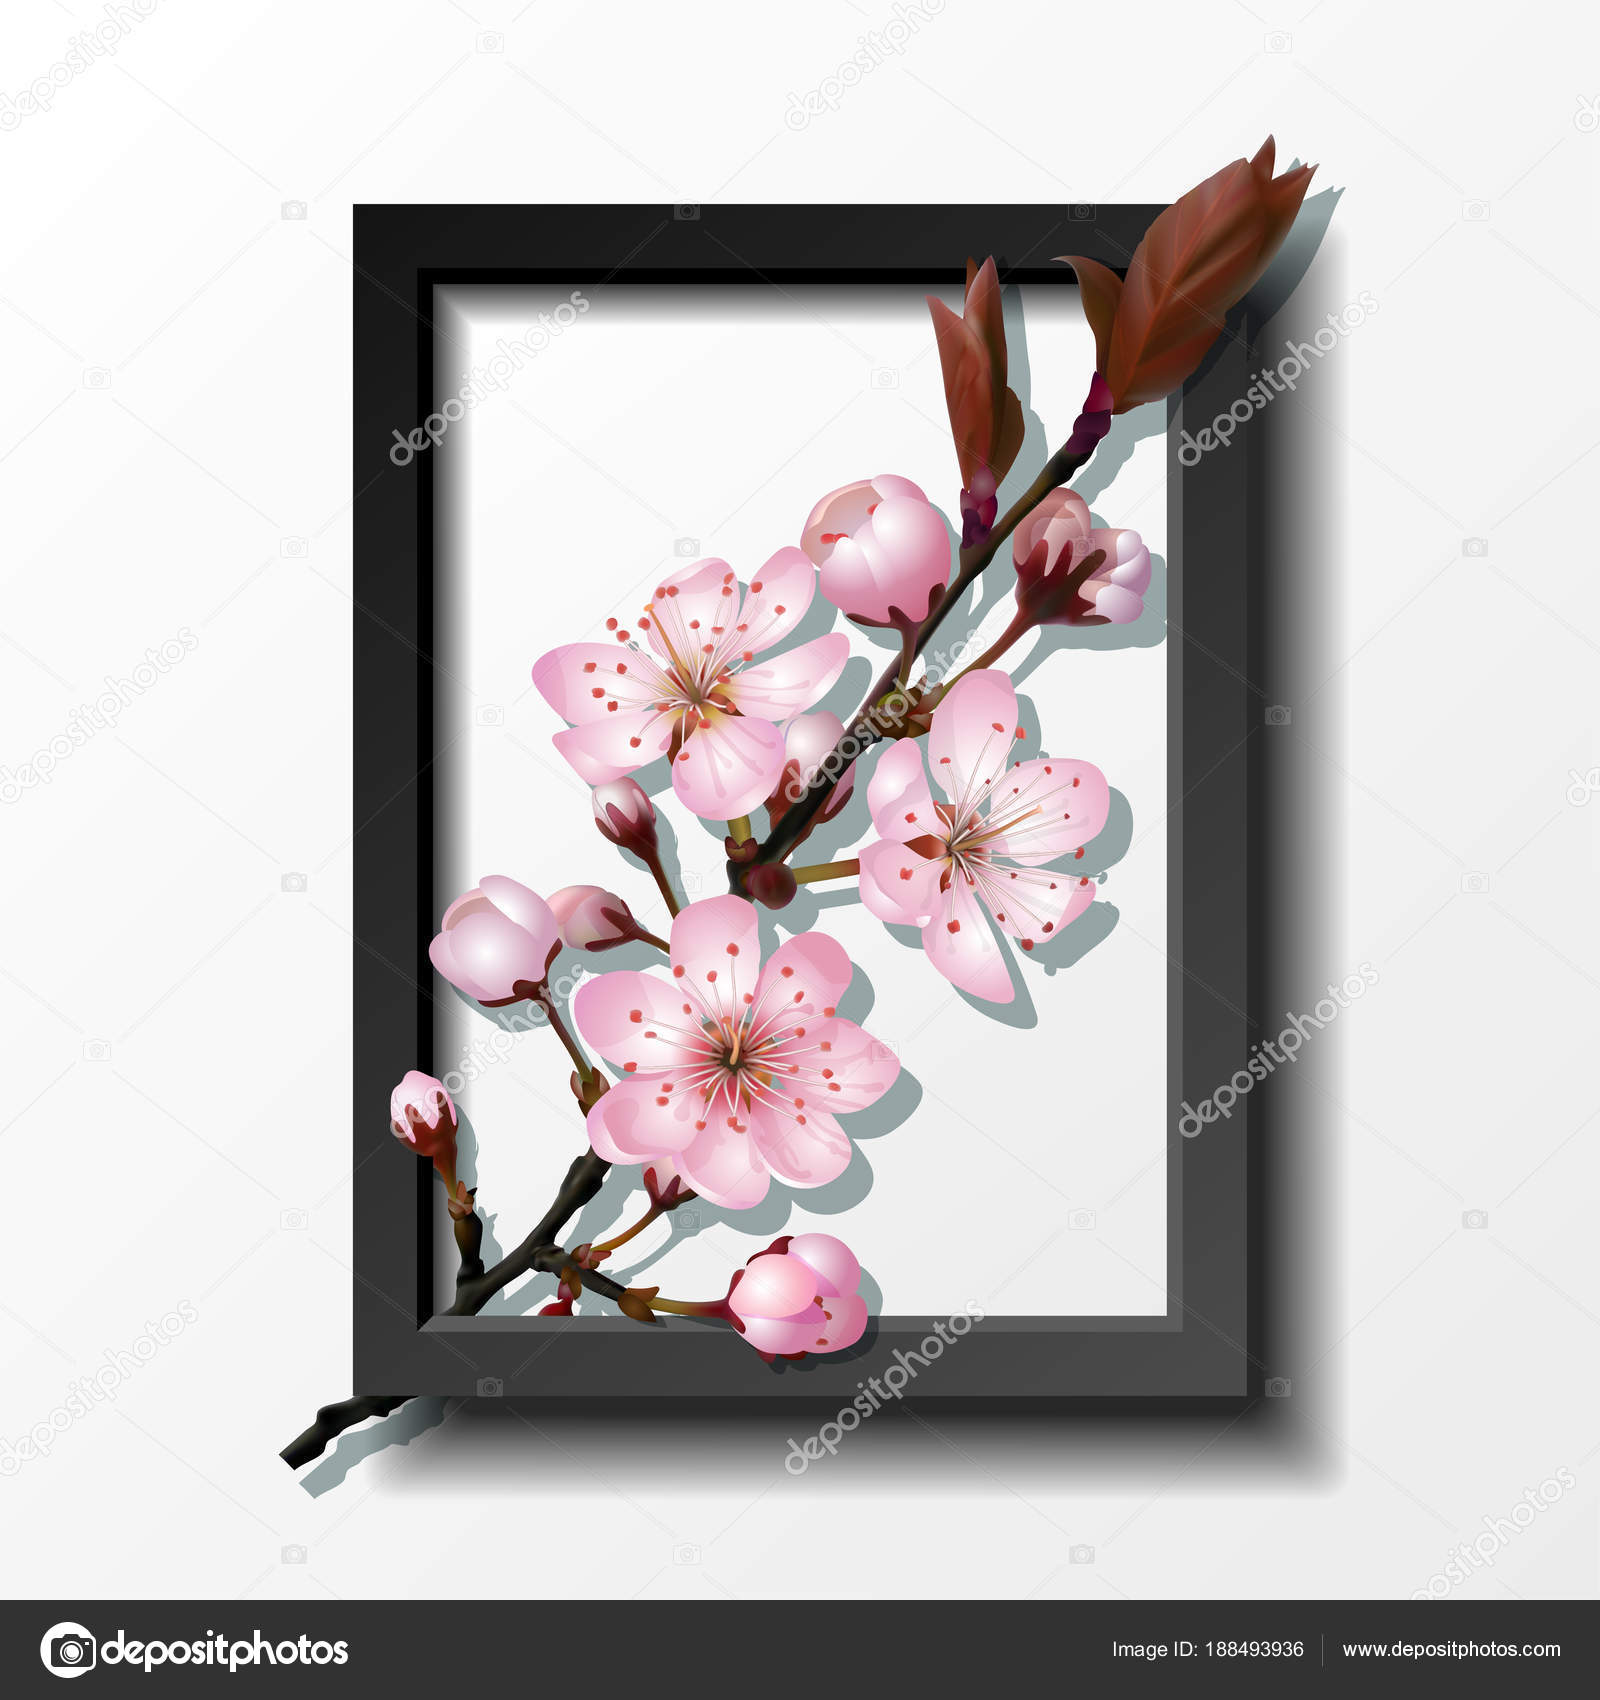 Arbol De Cerezo Dibujo Anime Ramo De Flores De Cerezo Rosa Sakura